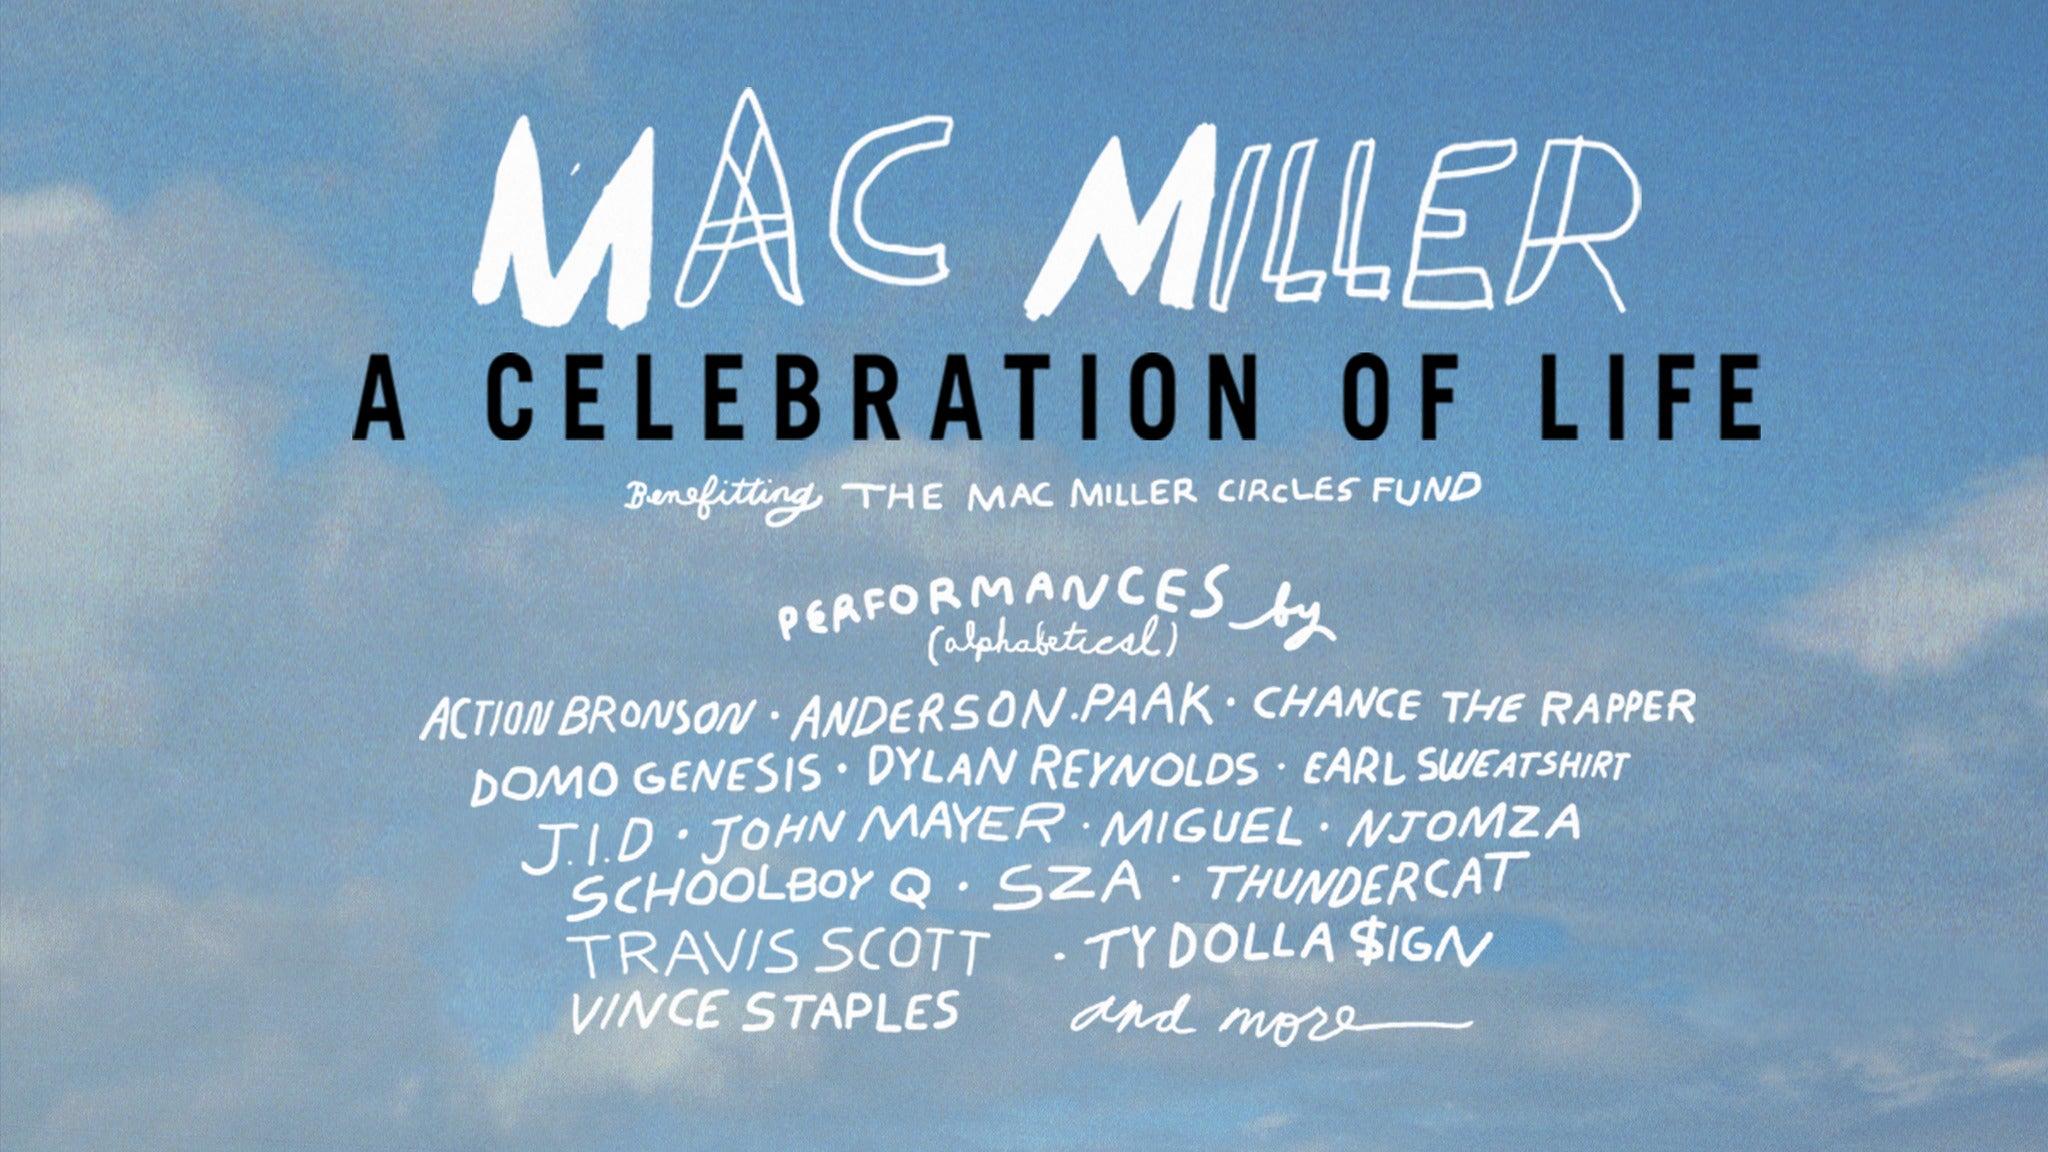 MAC MILLER: A CELEBRATION OF LIFE at Greek Theatre